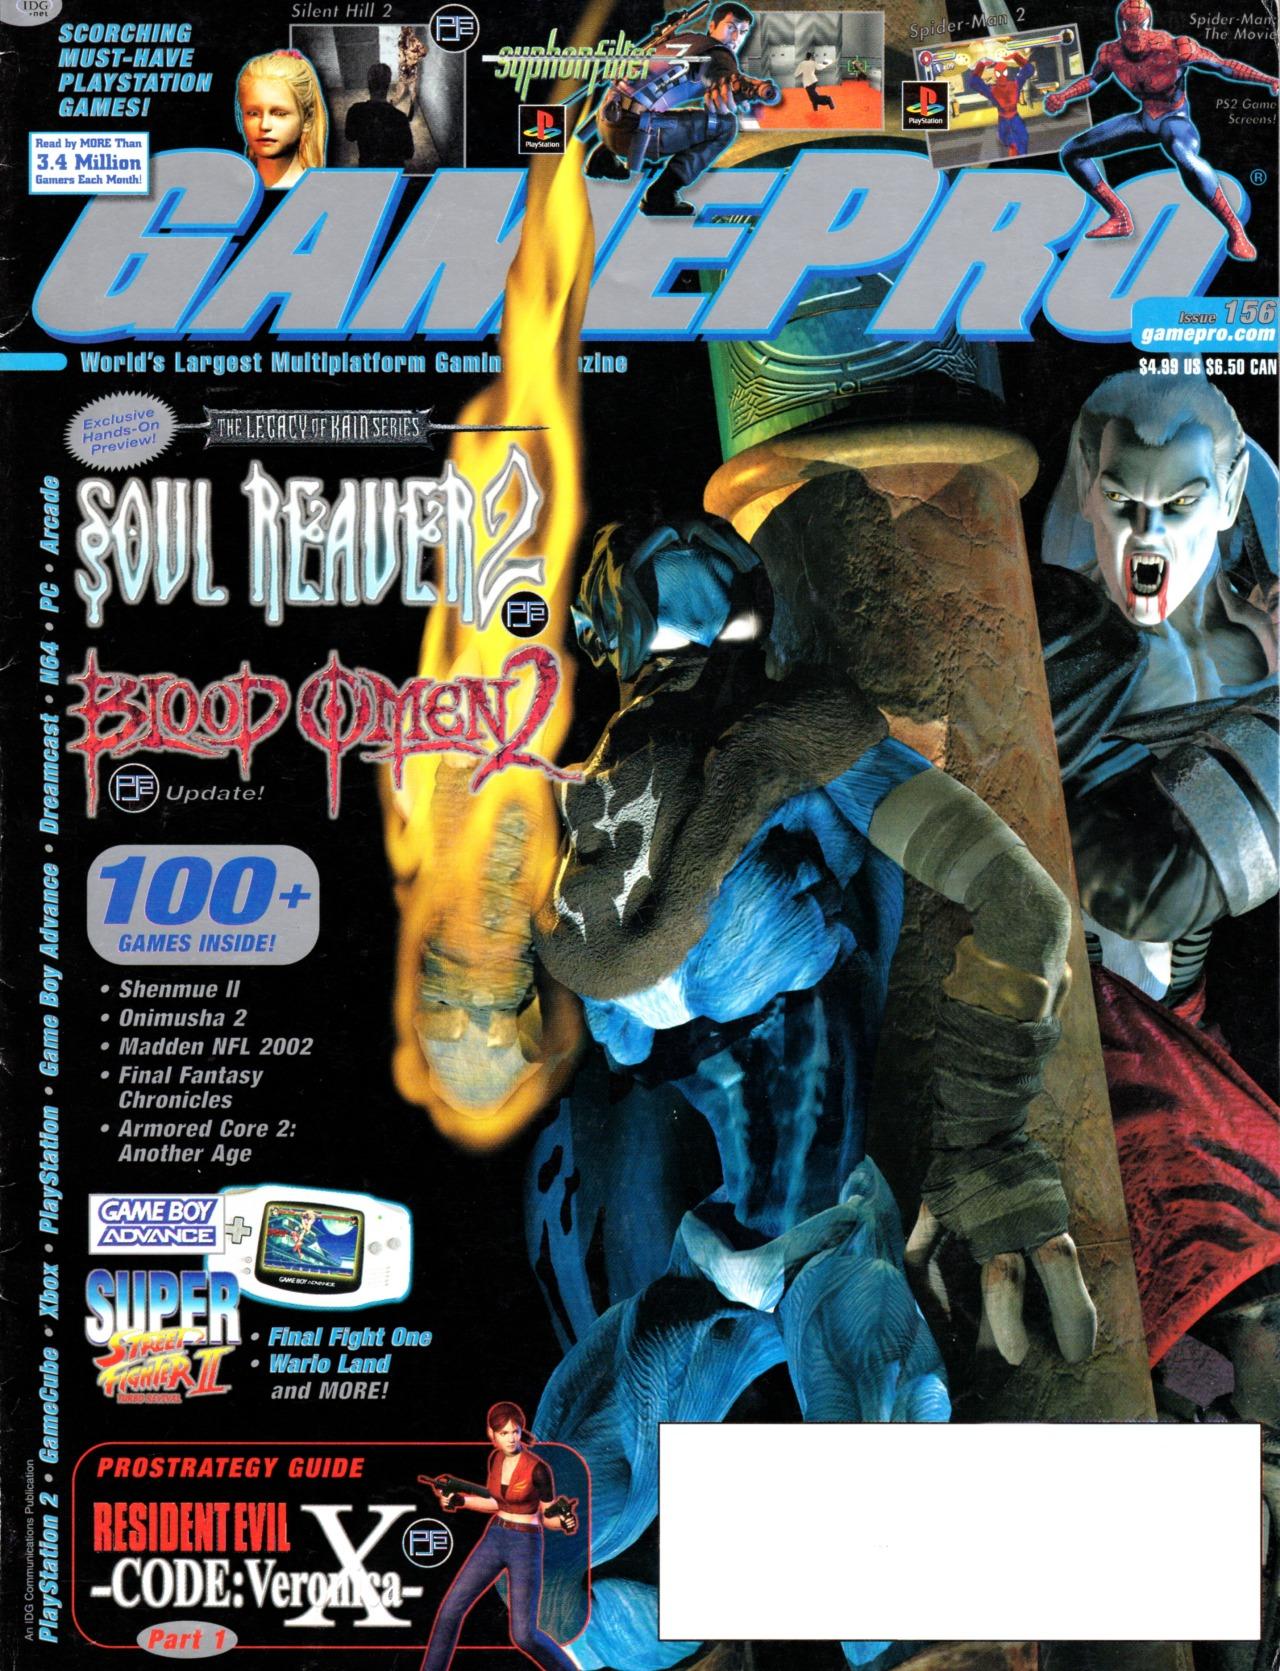 GamePro-71-1.jpg